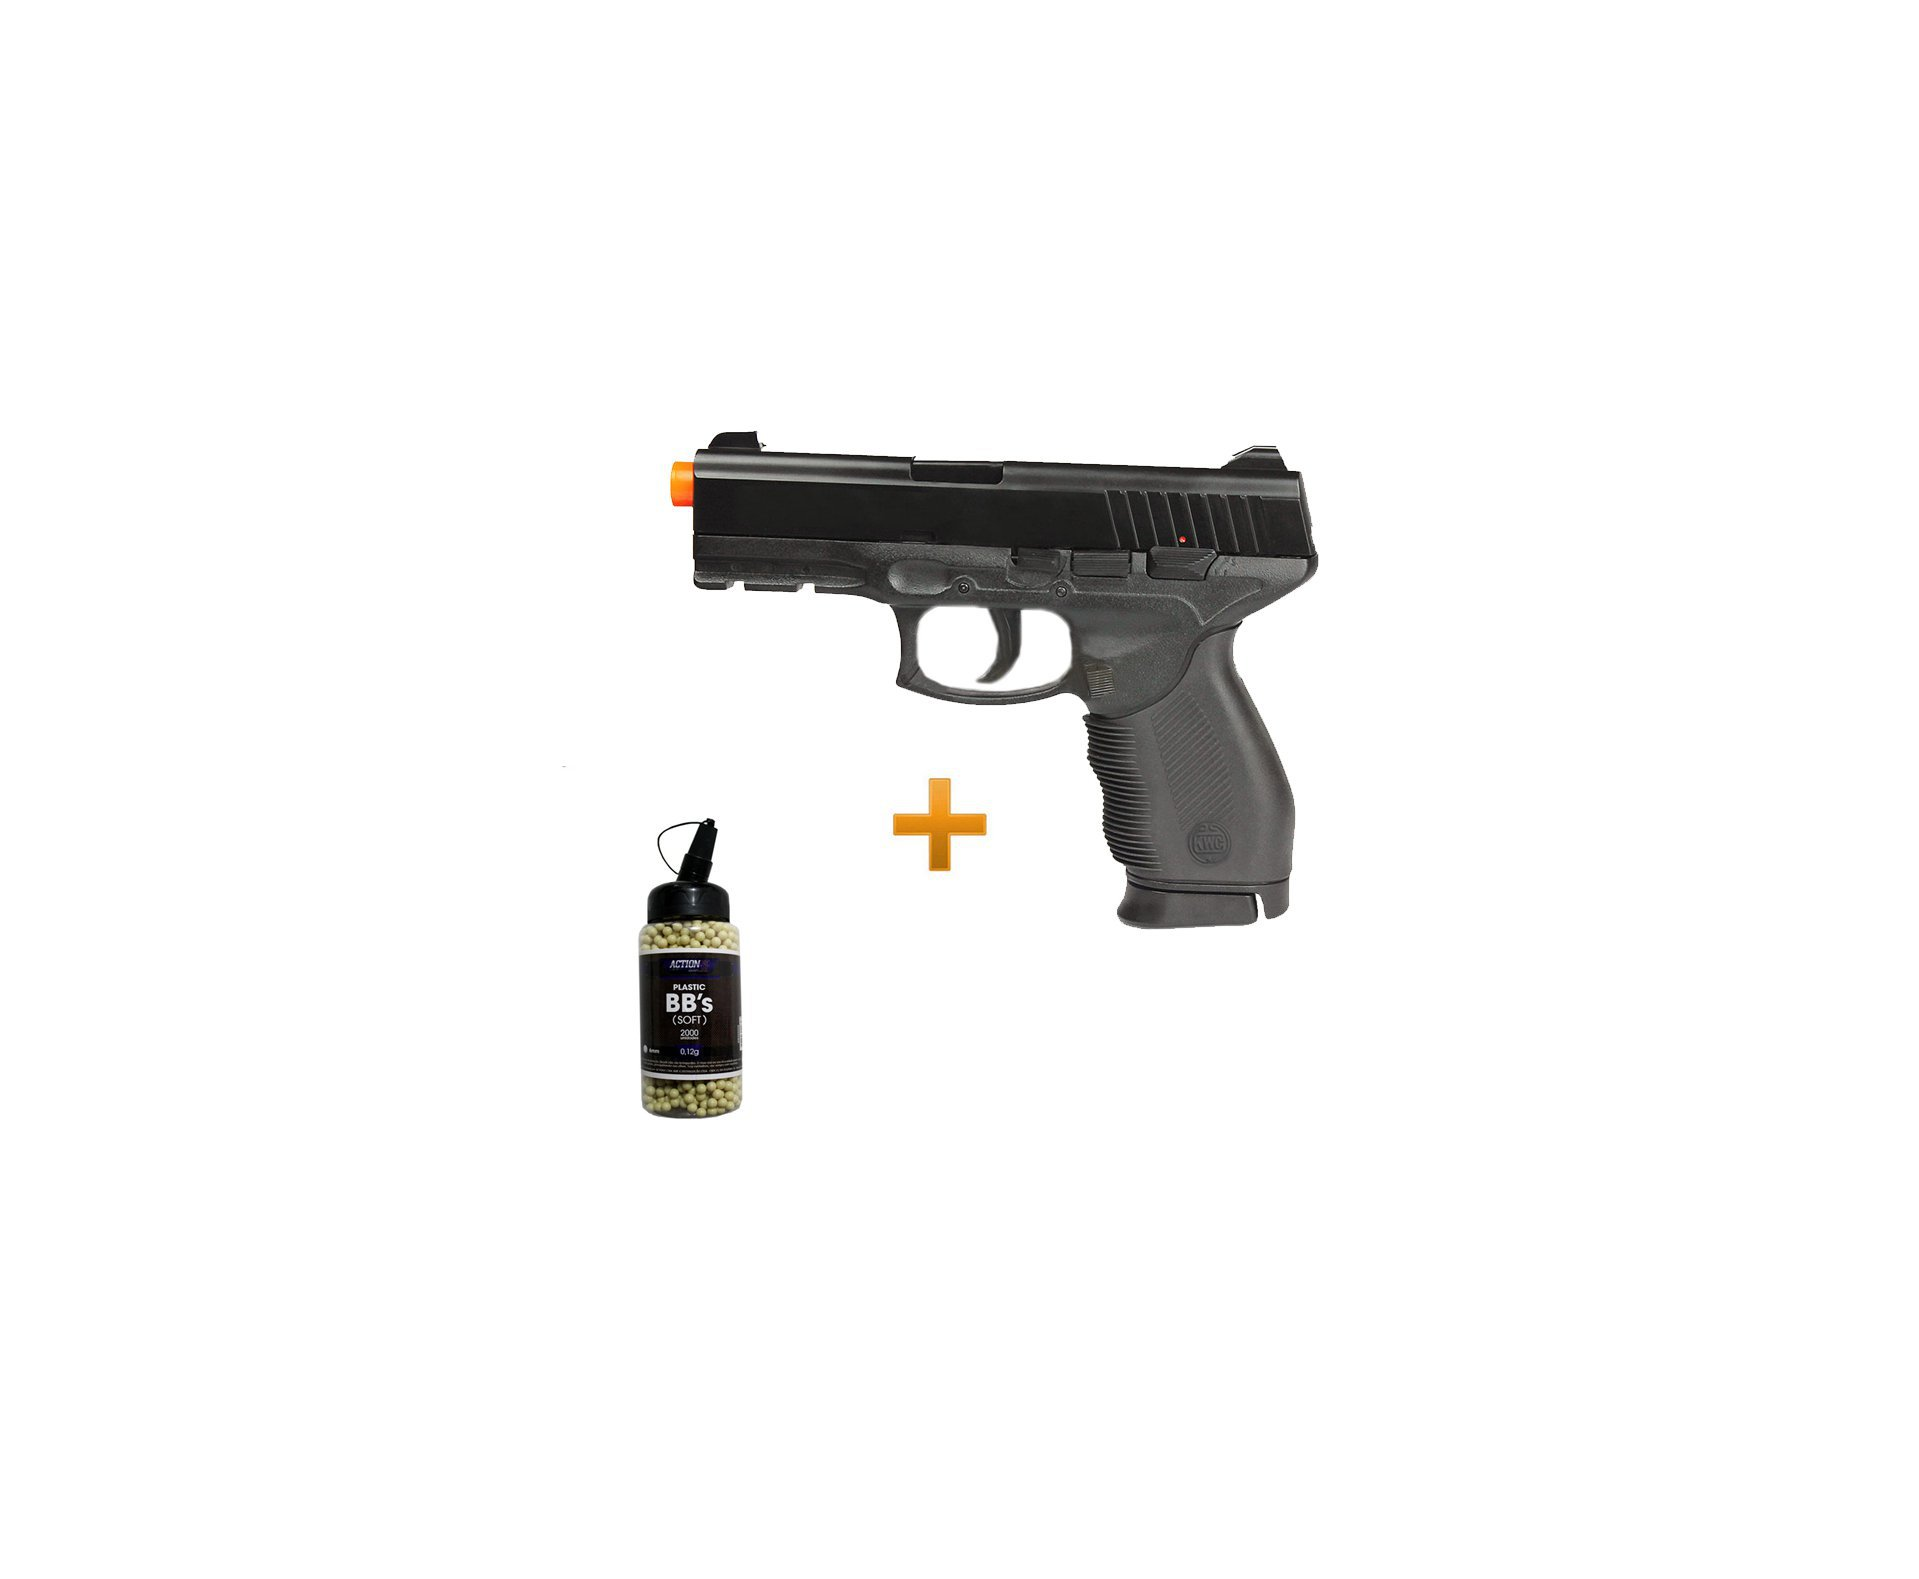 Pistola De Airsoft Pt 24/7 Semi/metal Cal 6,0mm + 2000 Esferas 0,12g - Kwc